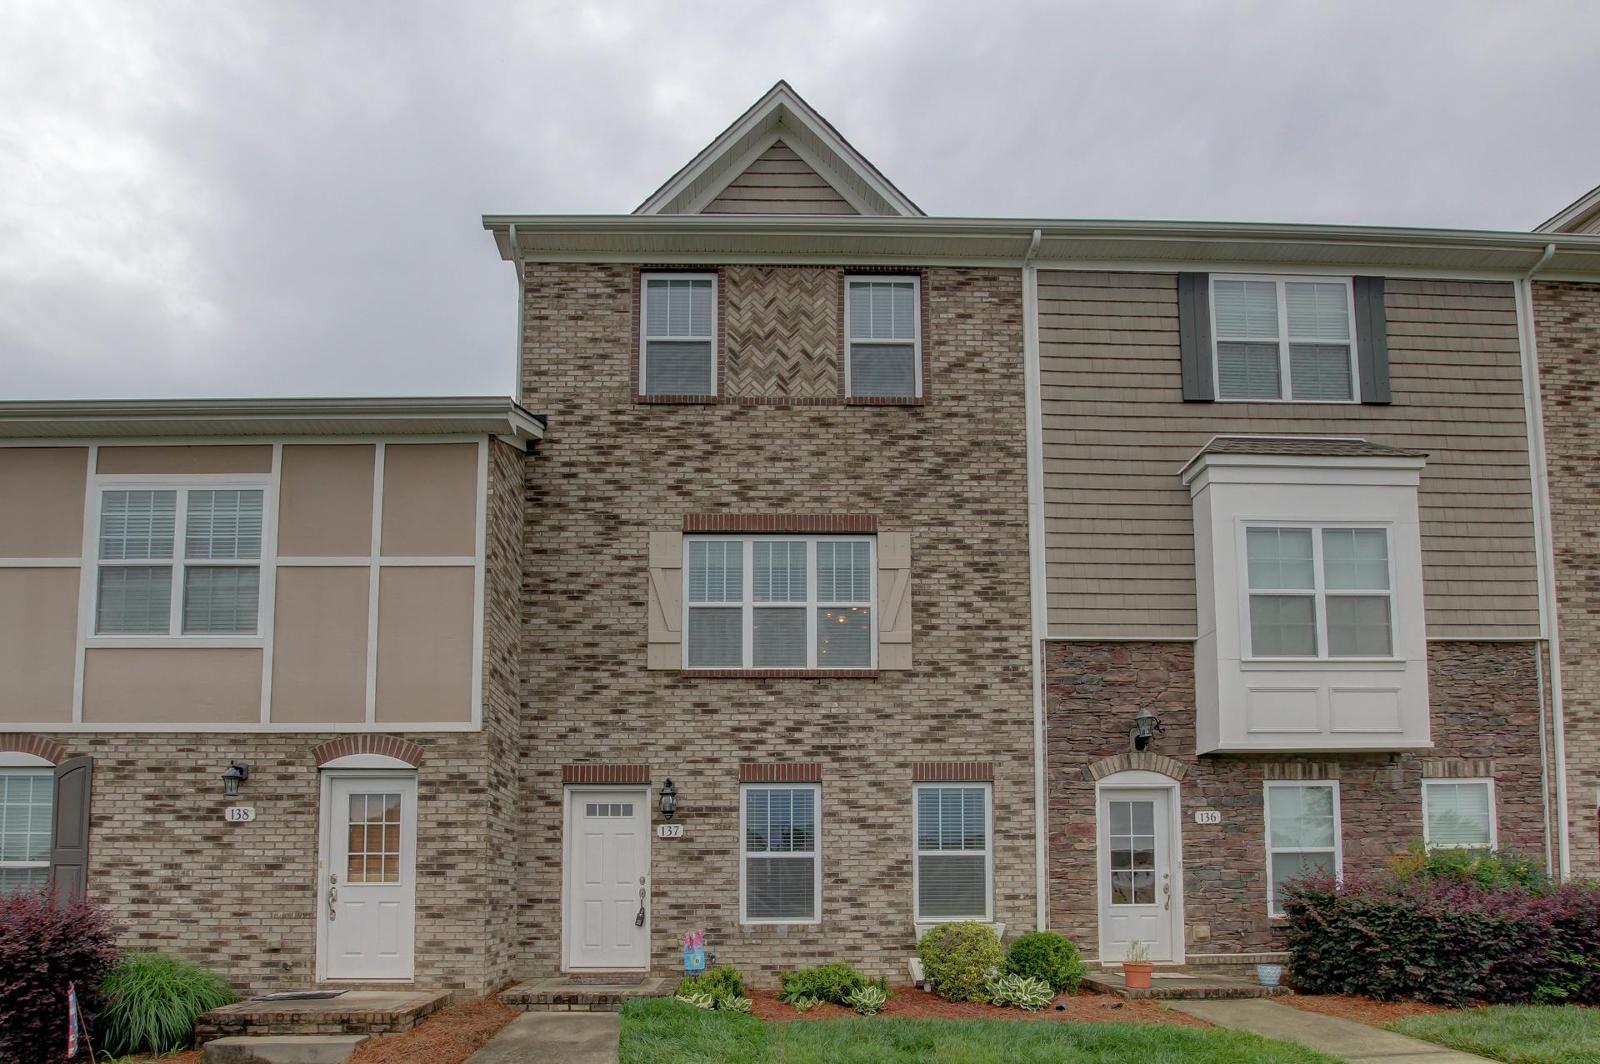 137 turn row dr clarksville tn mls 1834807 century for Home builders clarksville tn